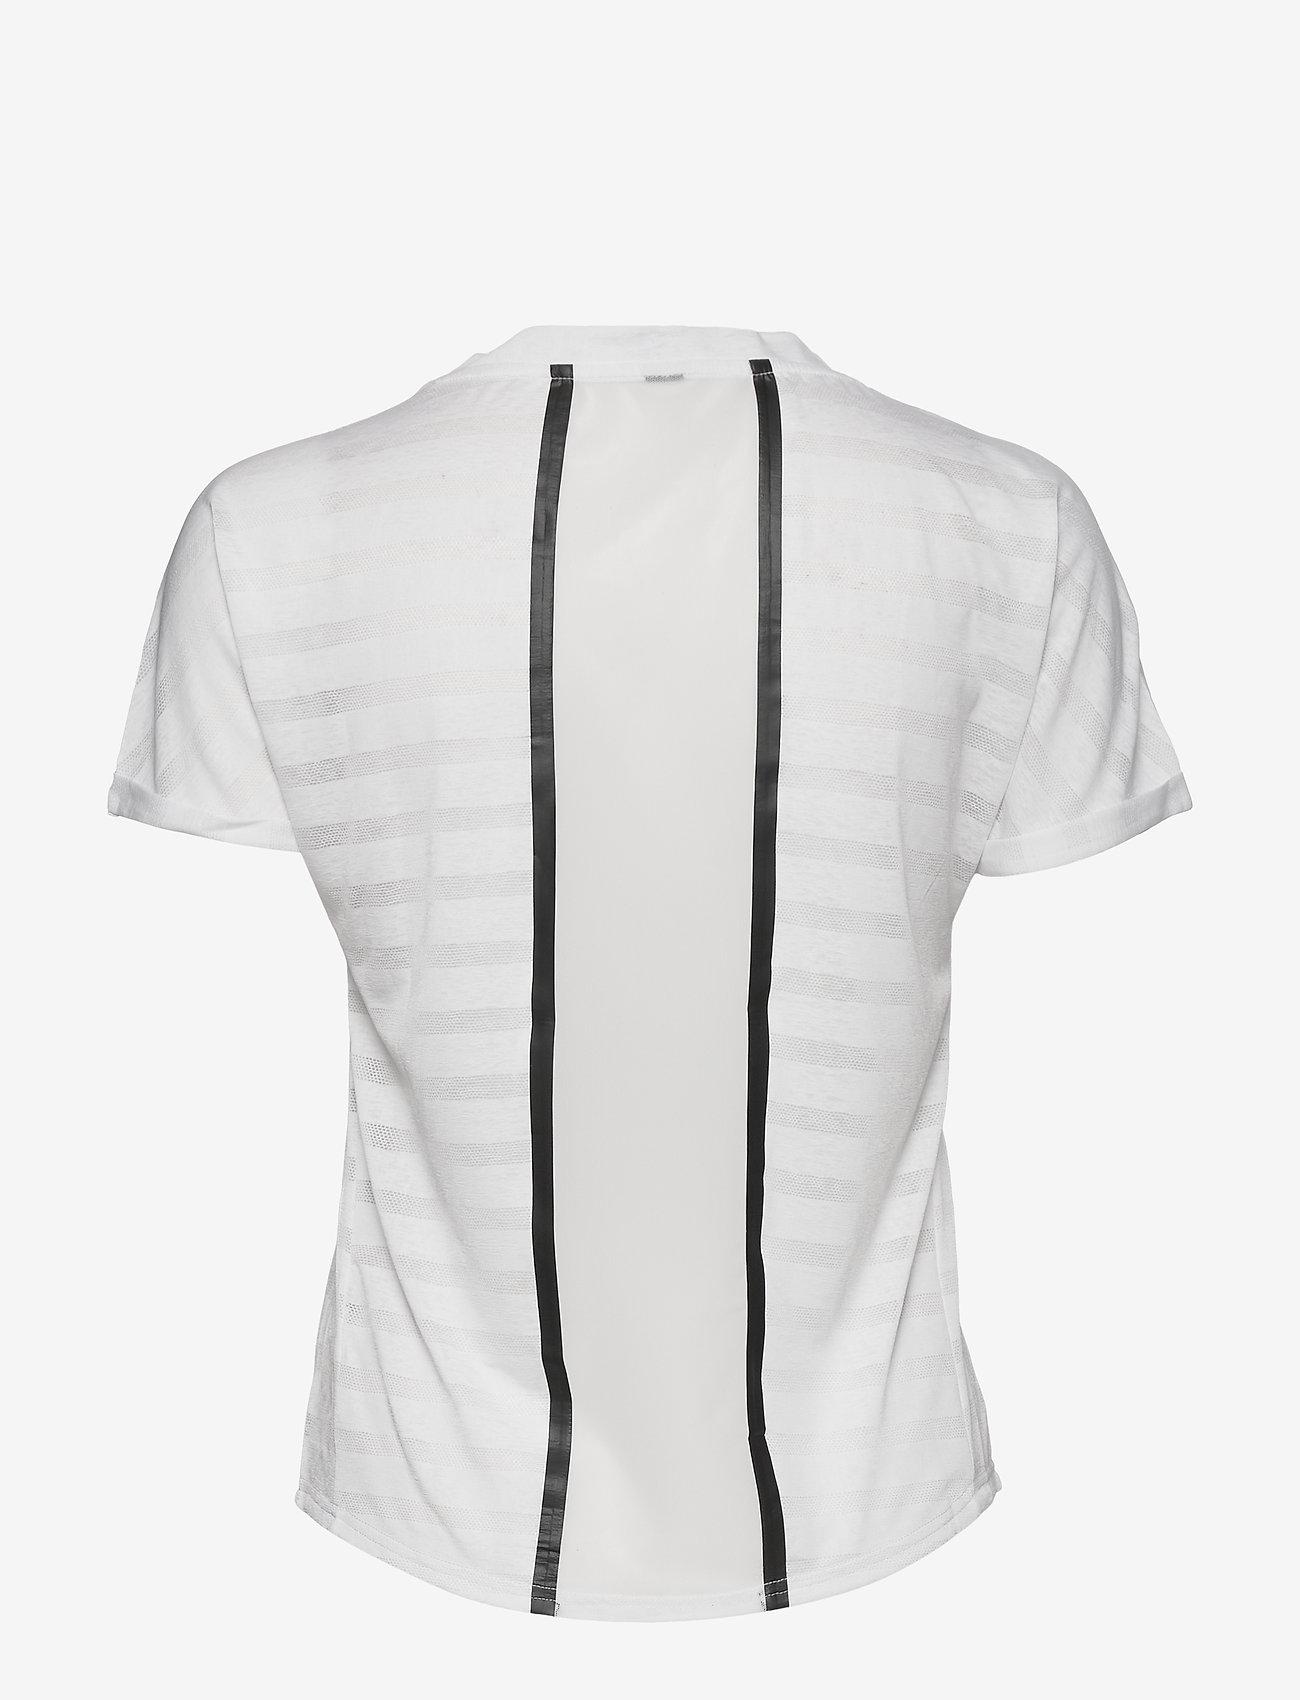 The North Face W Varuna Tee - T-shirts & Tops